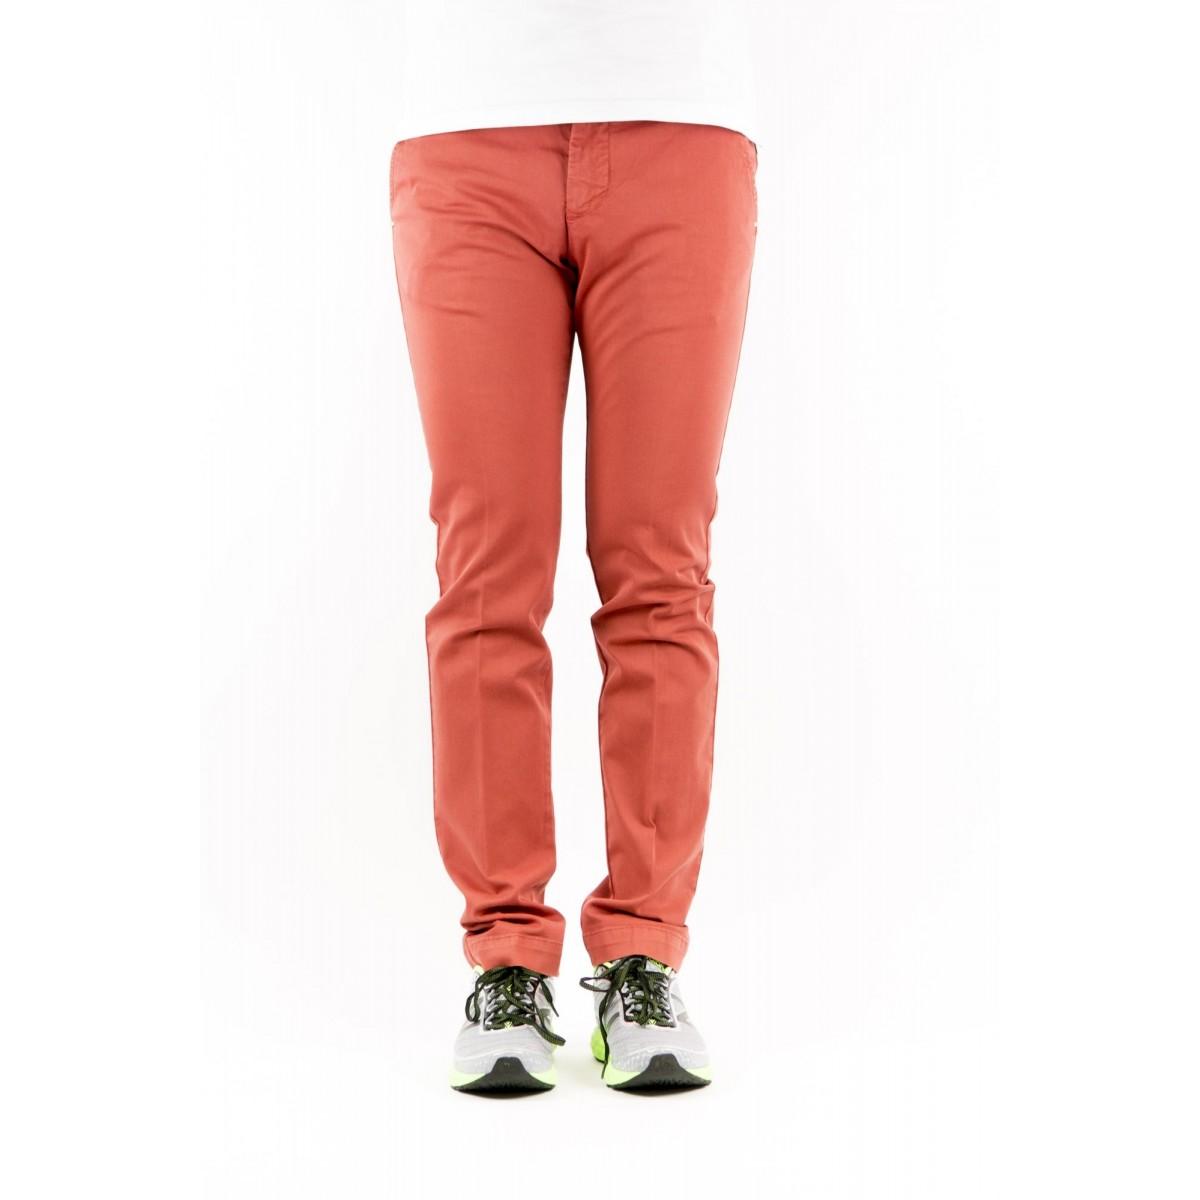 Pantalone uomo Entre amis - 8201 292l17 gabardina strech 0802 - mattone